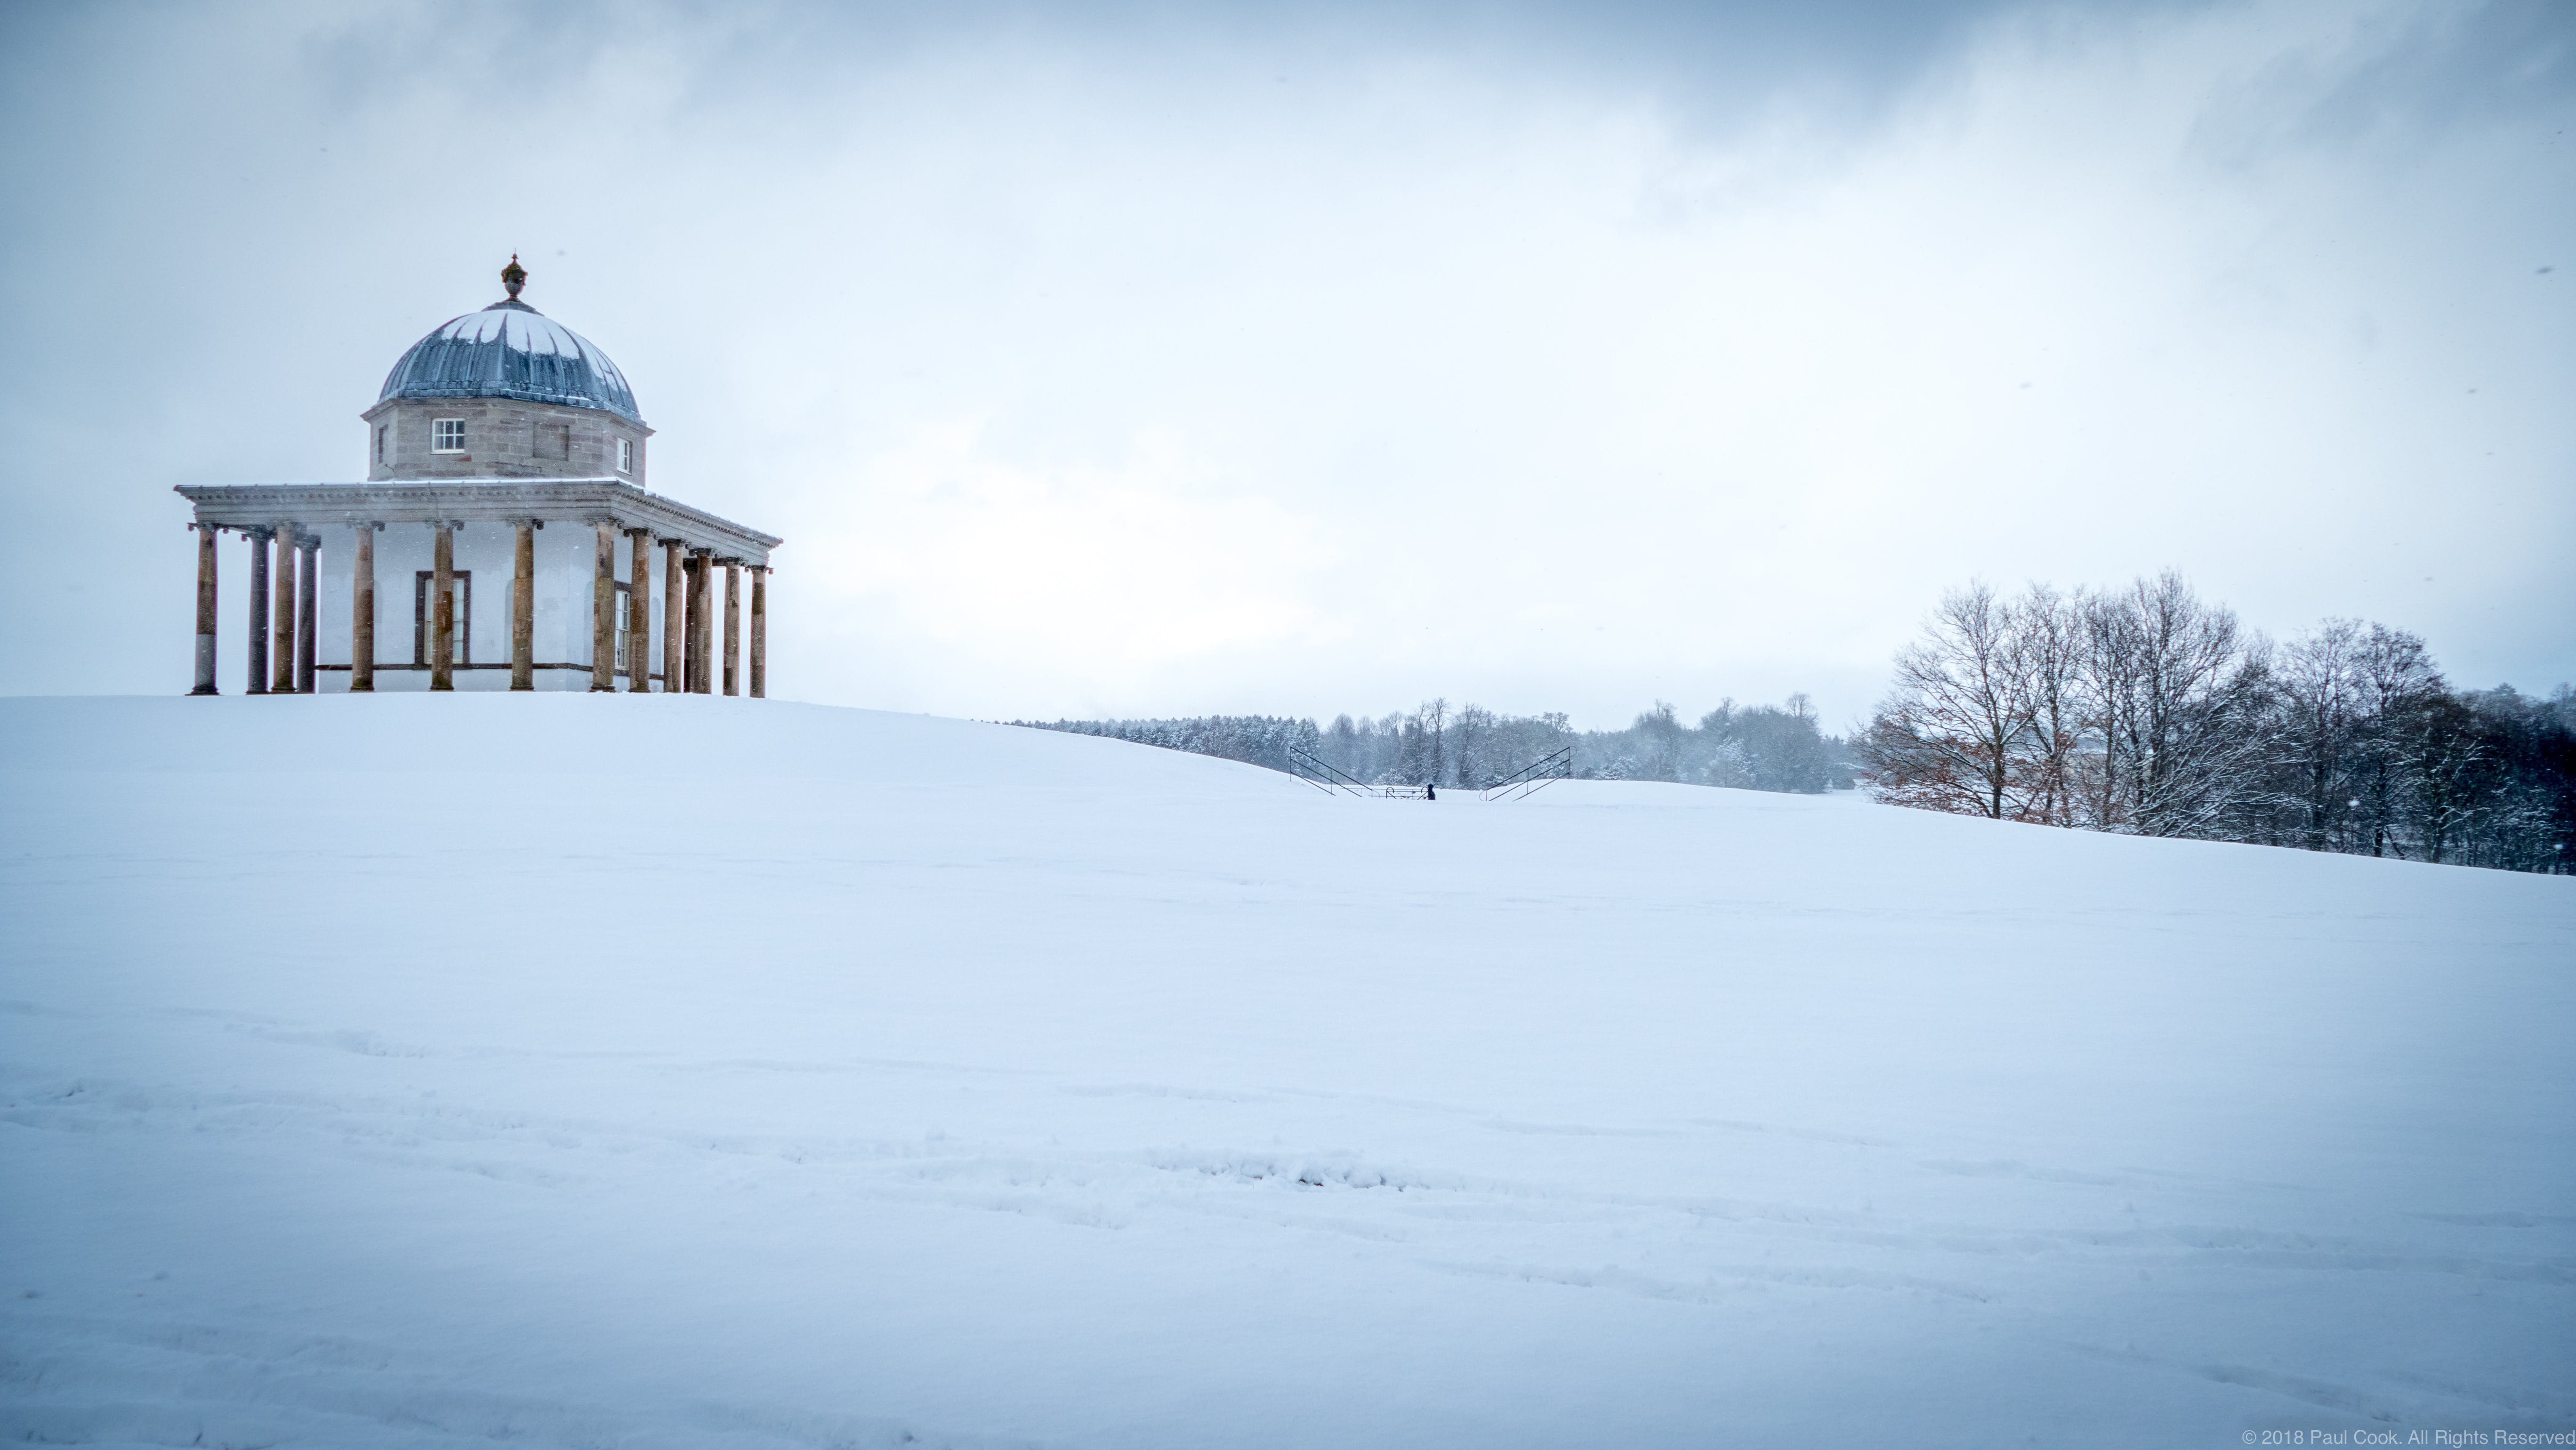 Free stock photo of folly, hardwick park, snow, winter